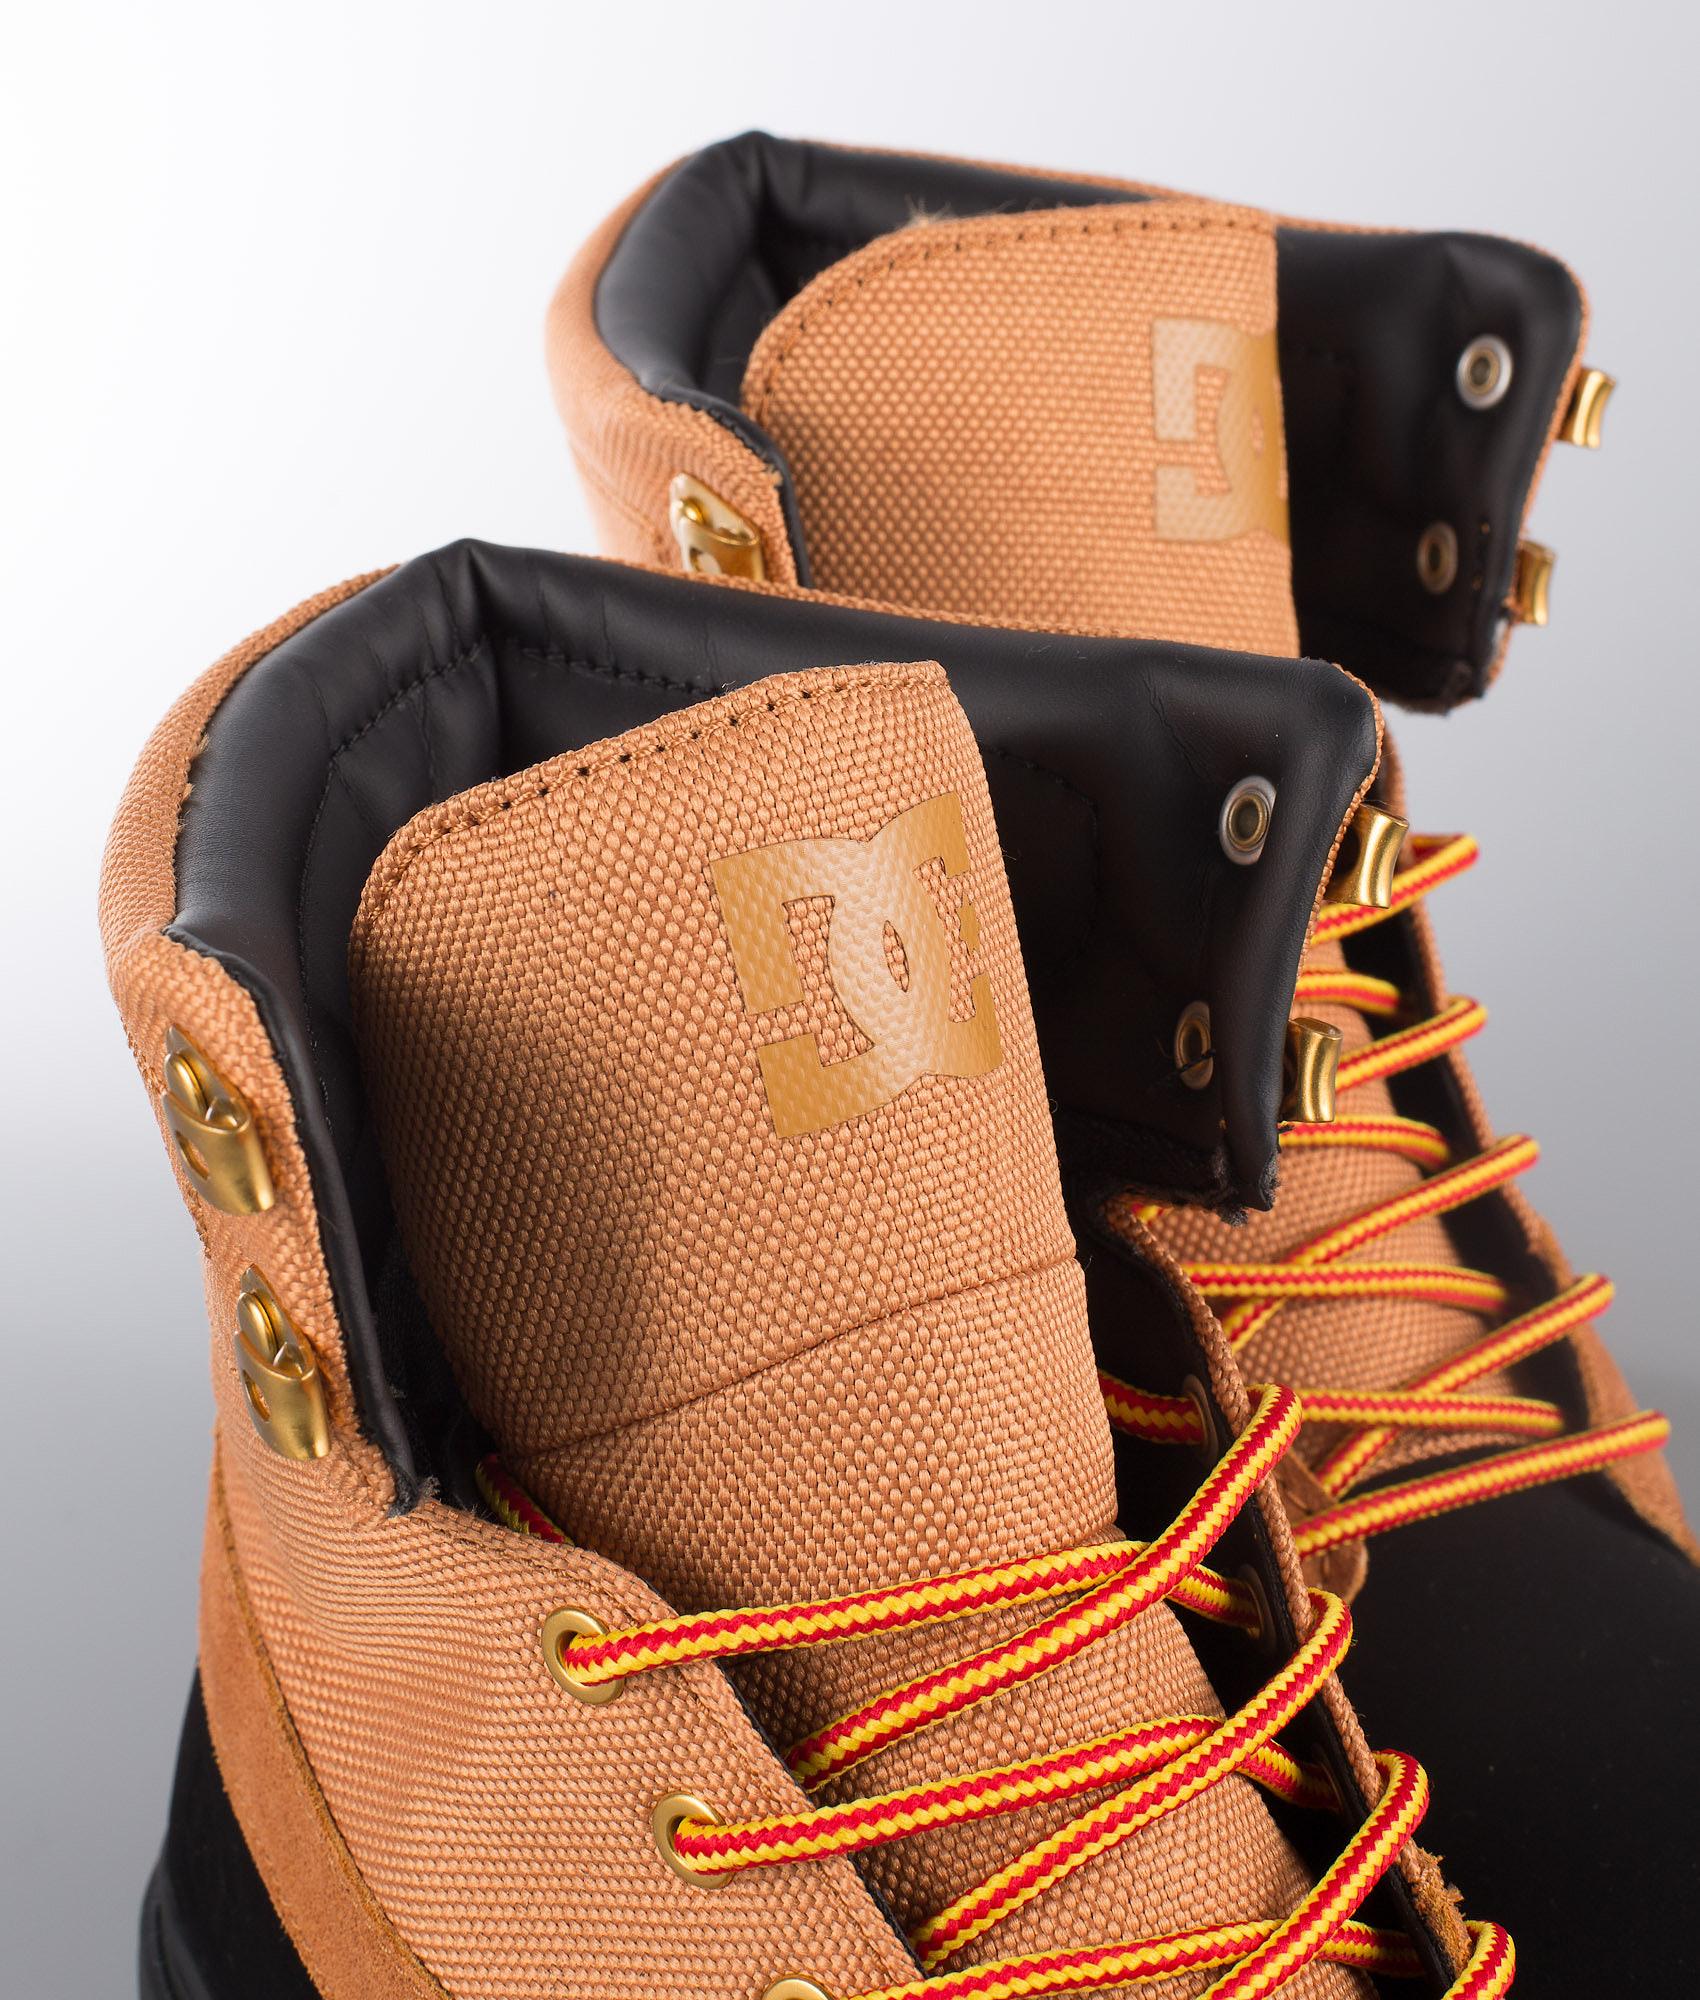 be2ea6ecac85 DC Uncas Tr Shoes Black/Wheat - Ridestore.com